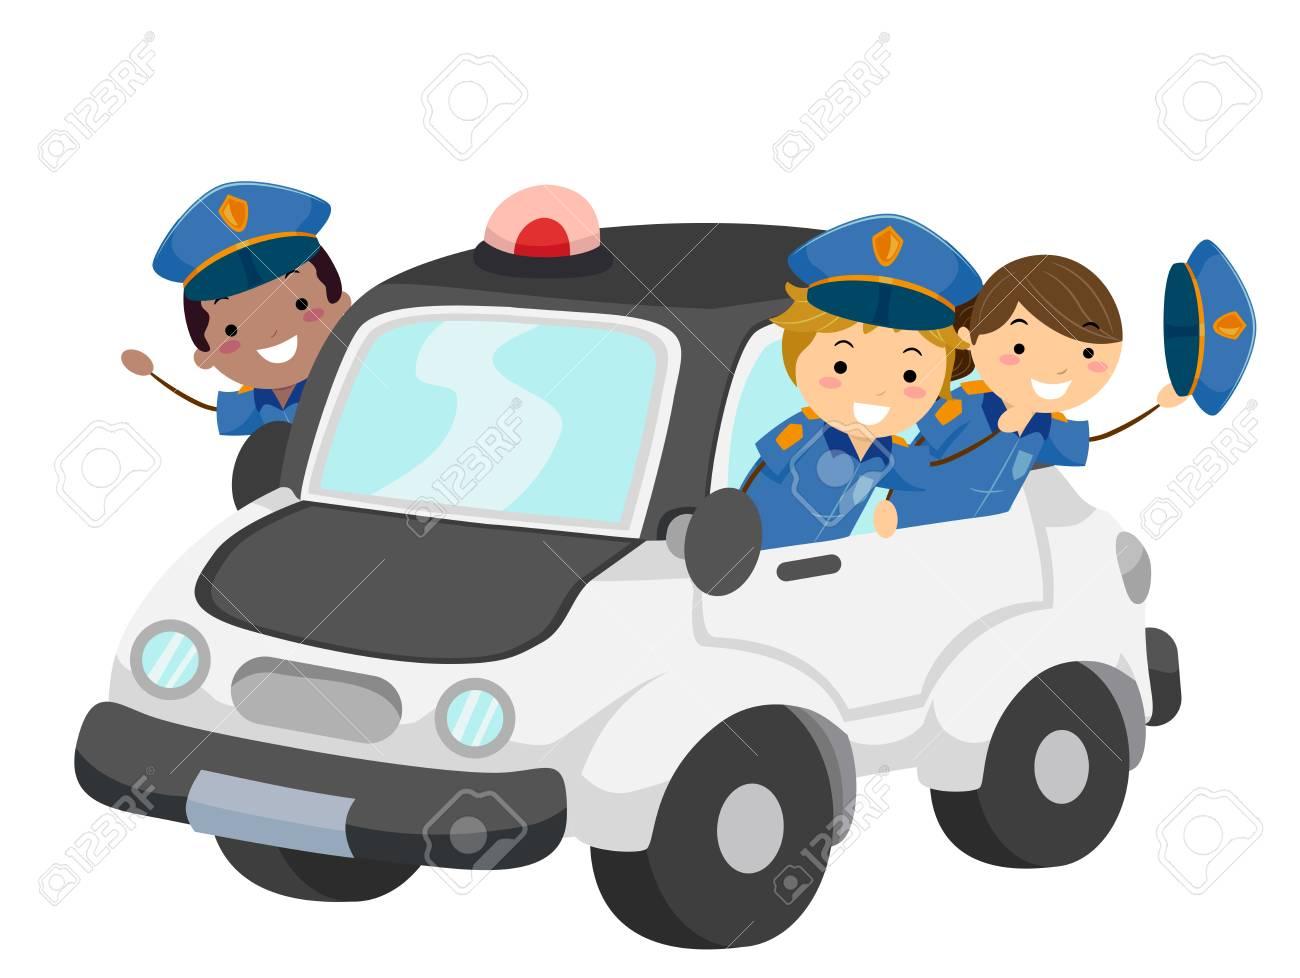 Illustration Of Stickman Kids Wearing Police Uniform Riding A